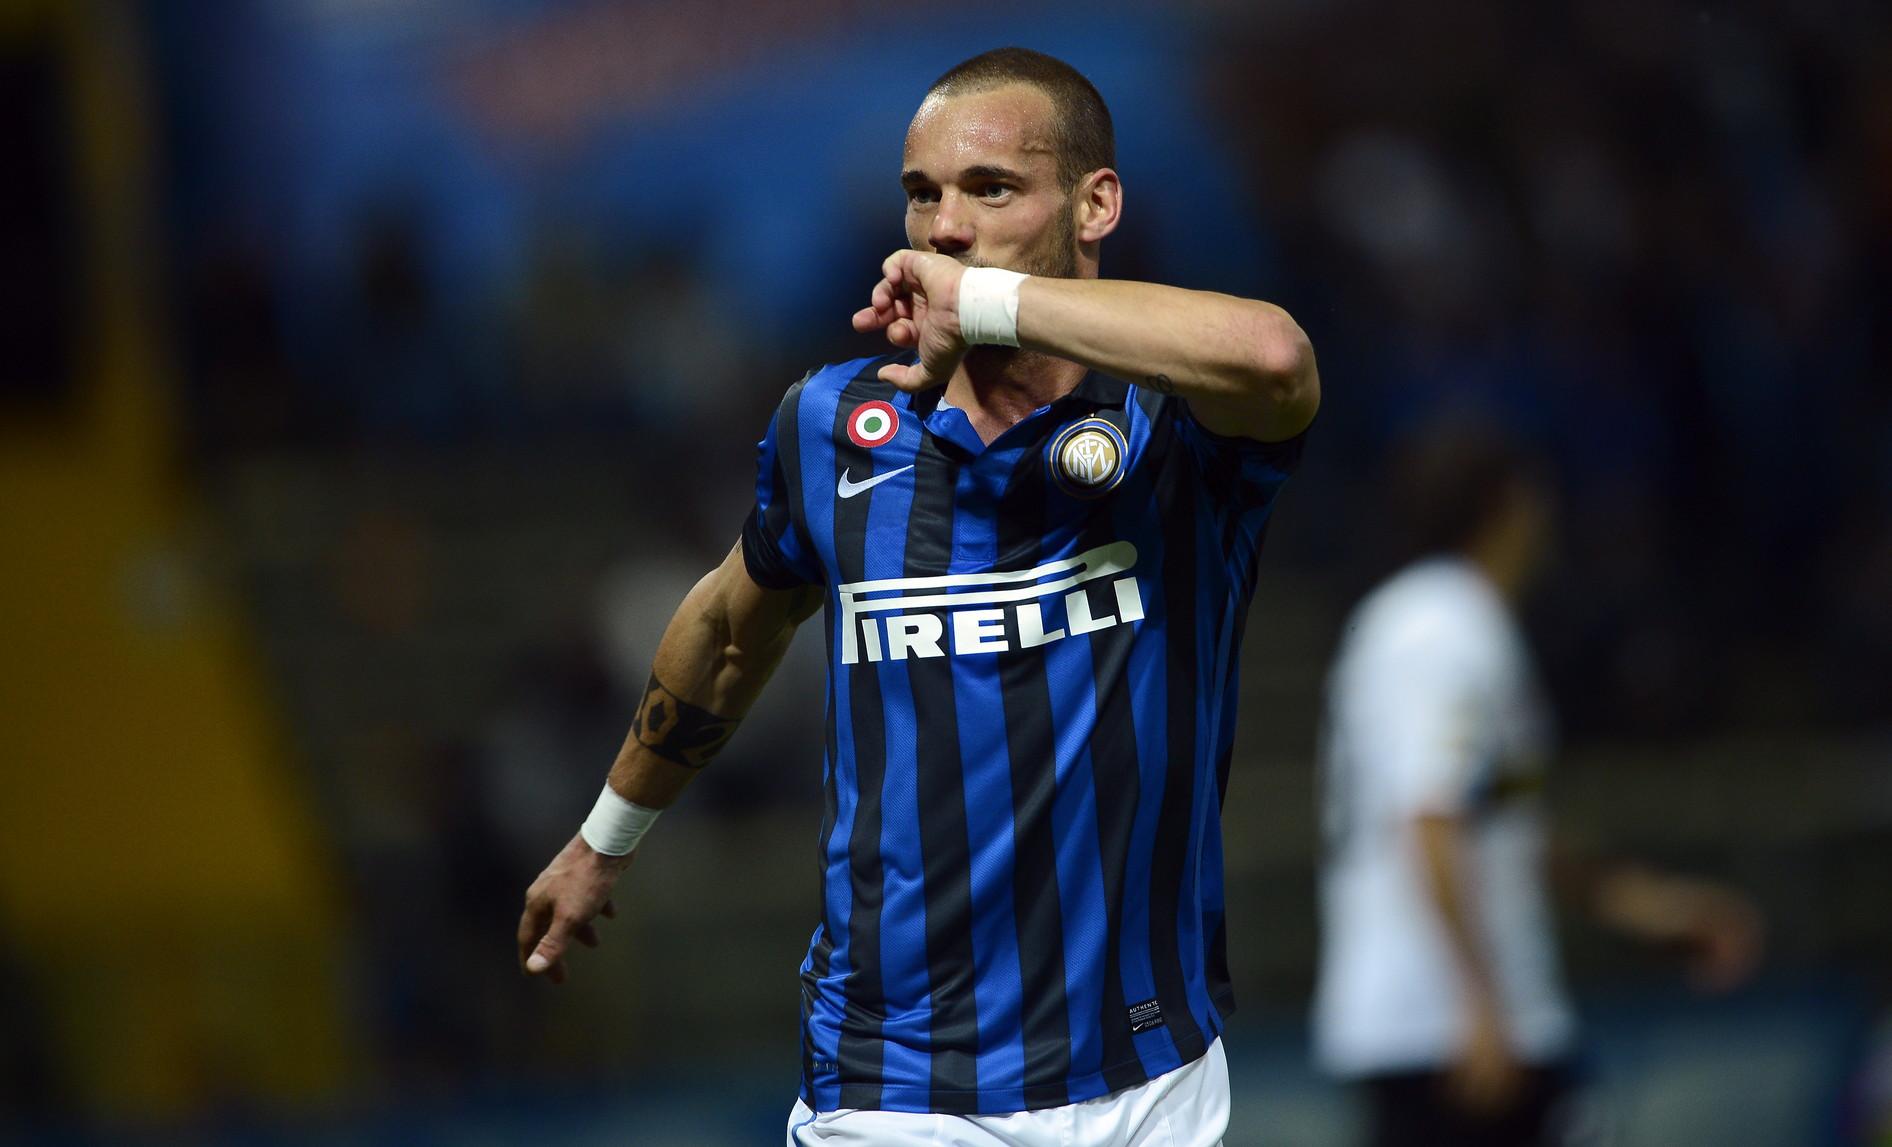 Wesley Sneijder ai tempi dell'Inter (2009-2013)